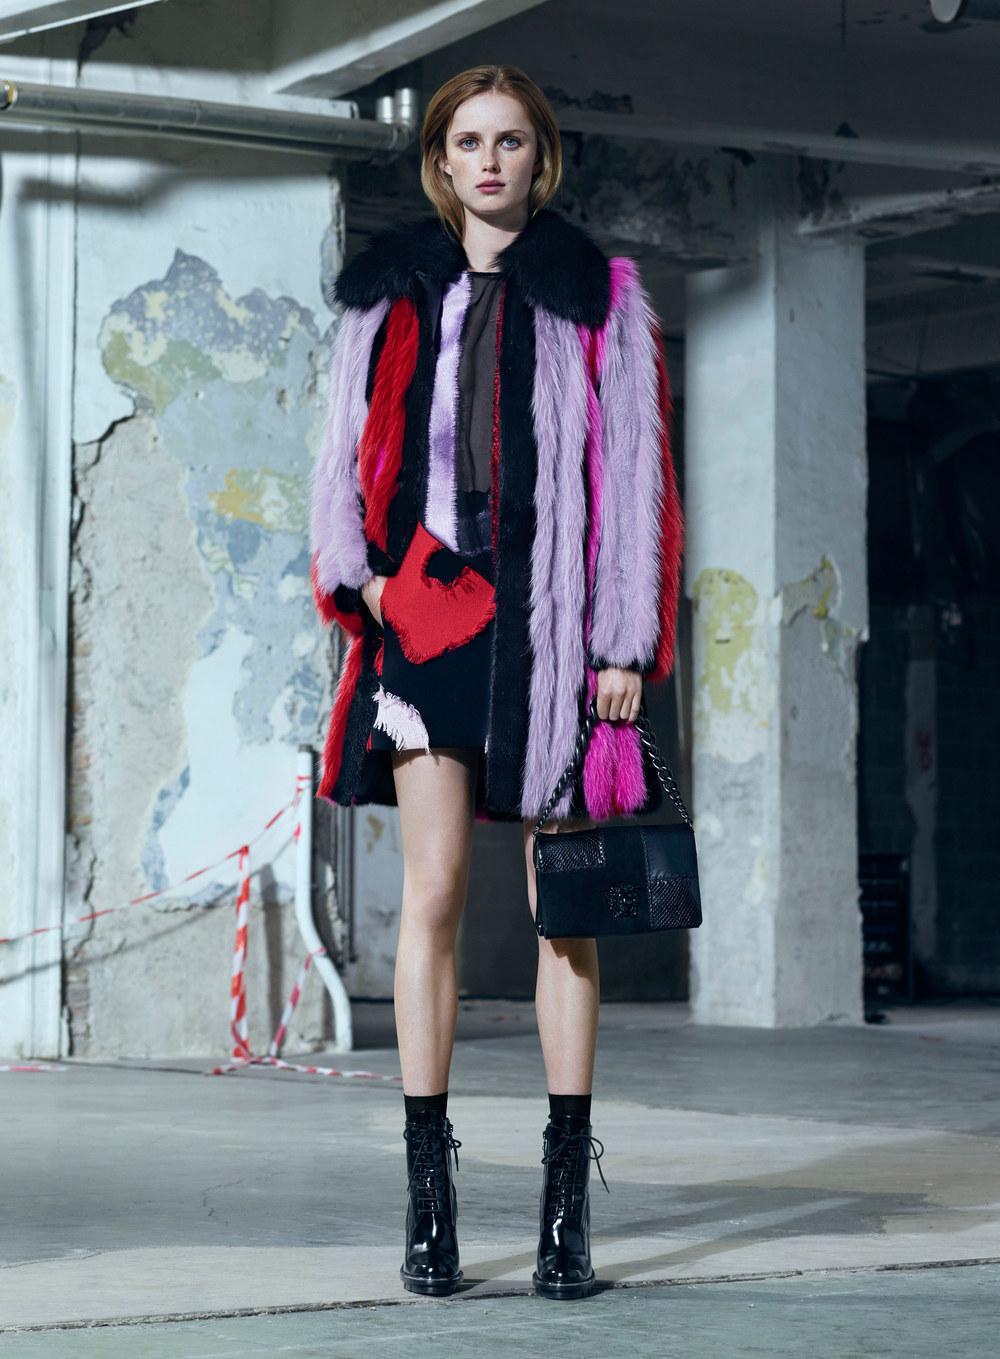 versace-pre-fall-2016-lookbook-21.jpg